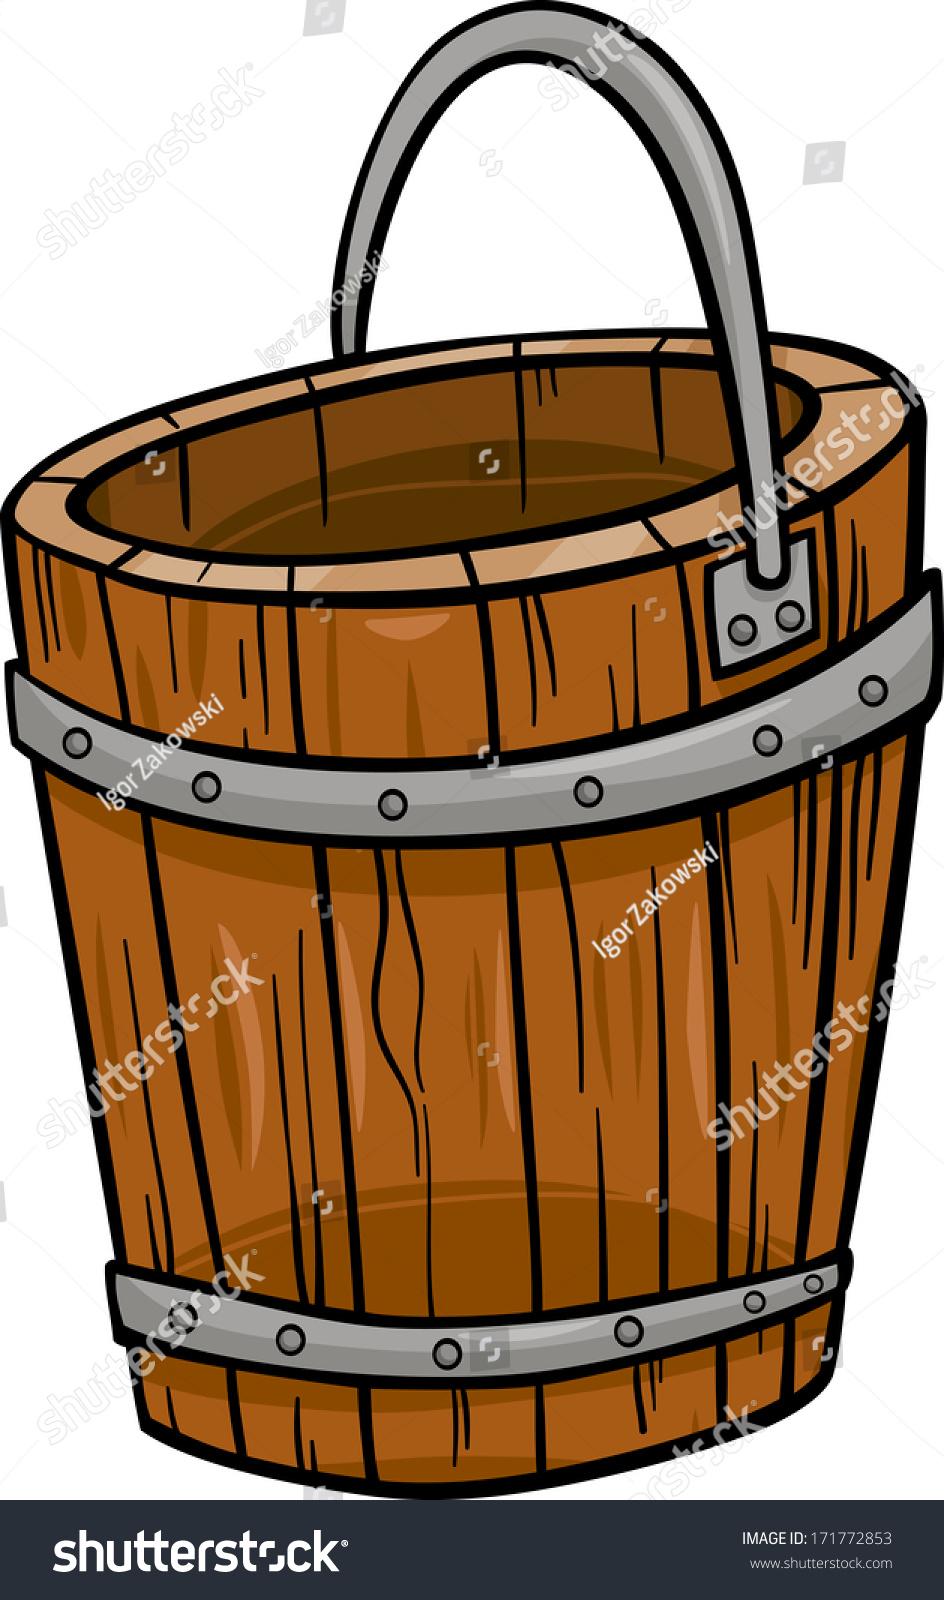 Cartoon Vector Illustration Wooden Bucket Retro Stock Vector ...